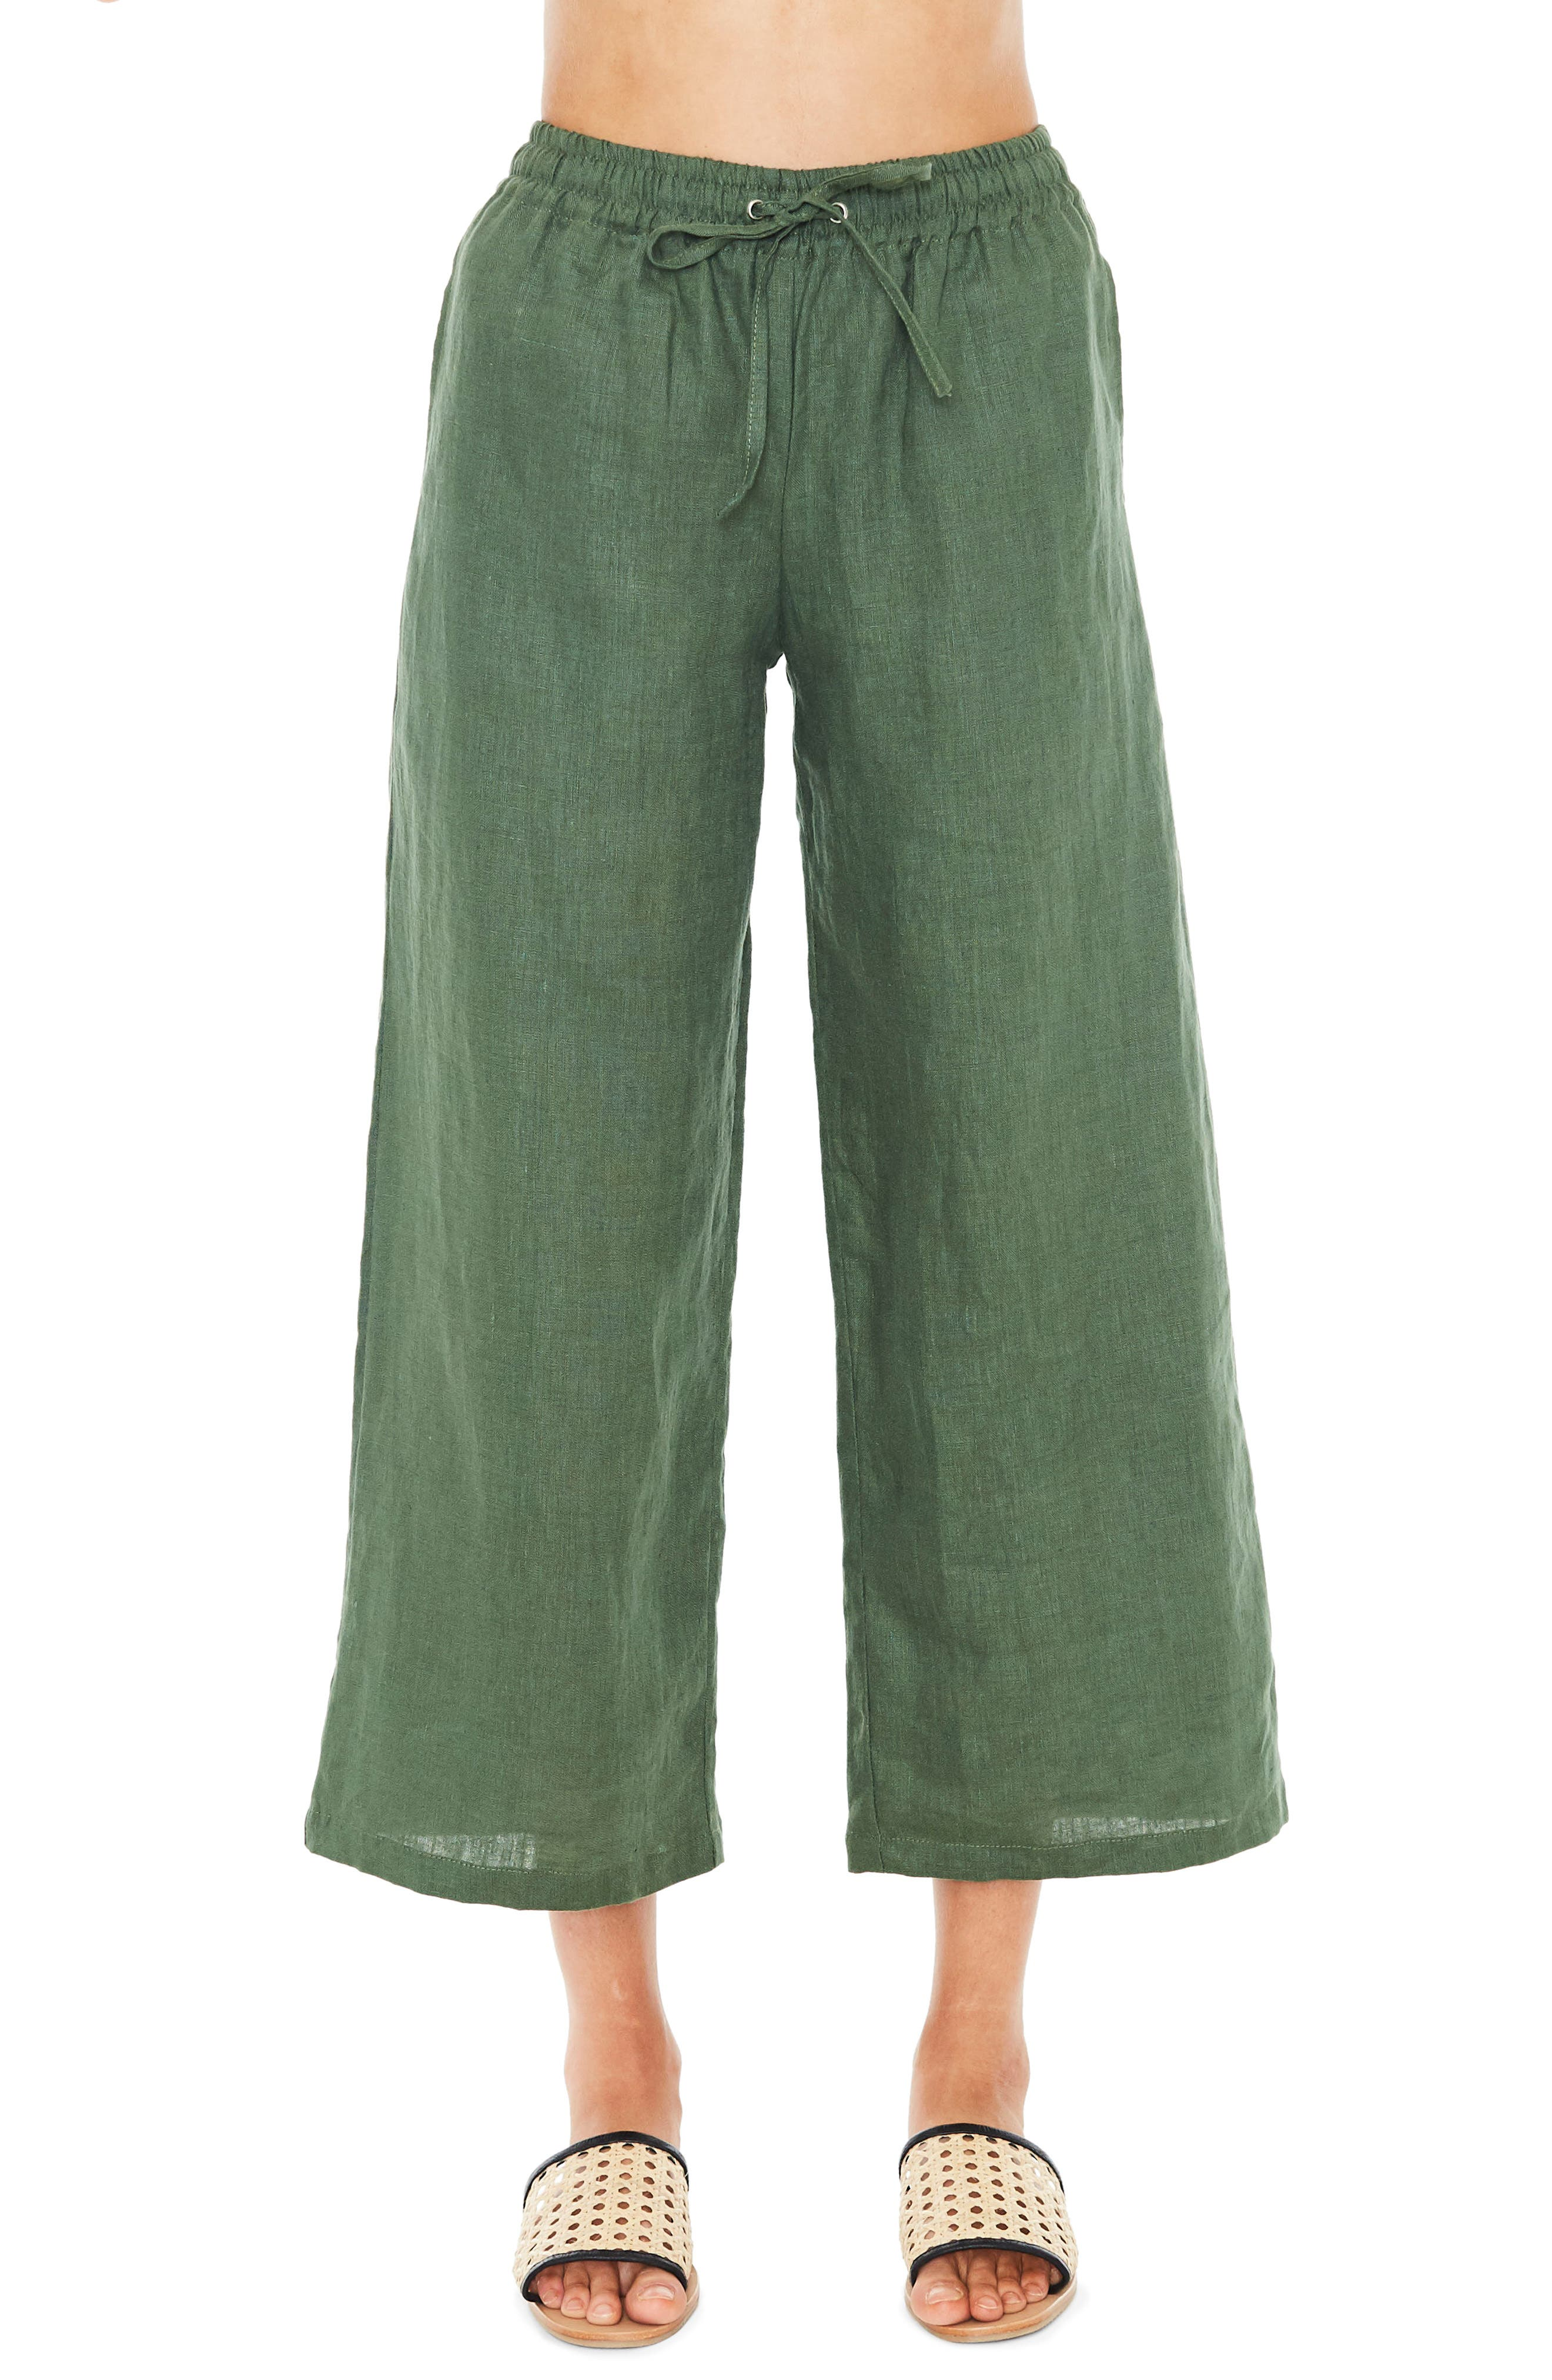 Clemence Linen Pants,                             Main thumbnail 1, color,                             PLAIN MOSS GREEN